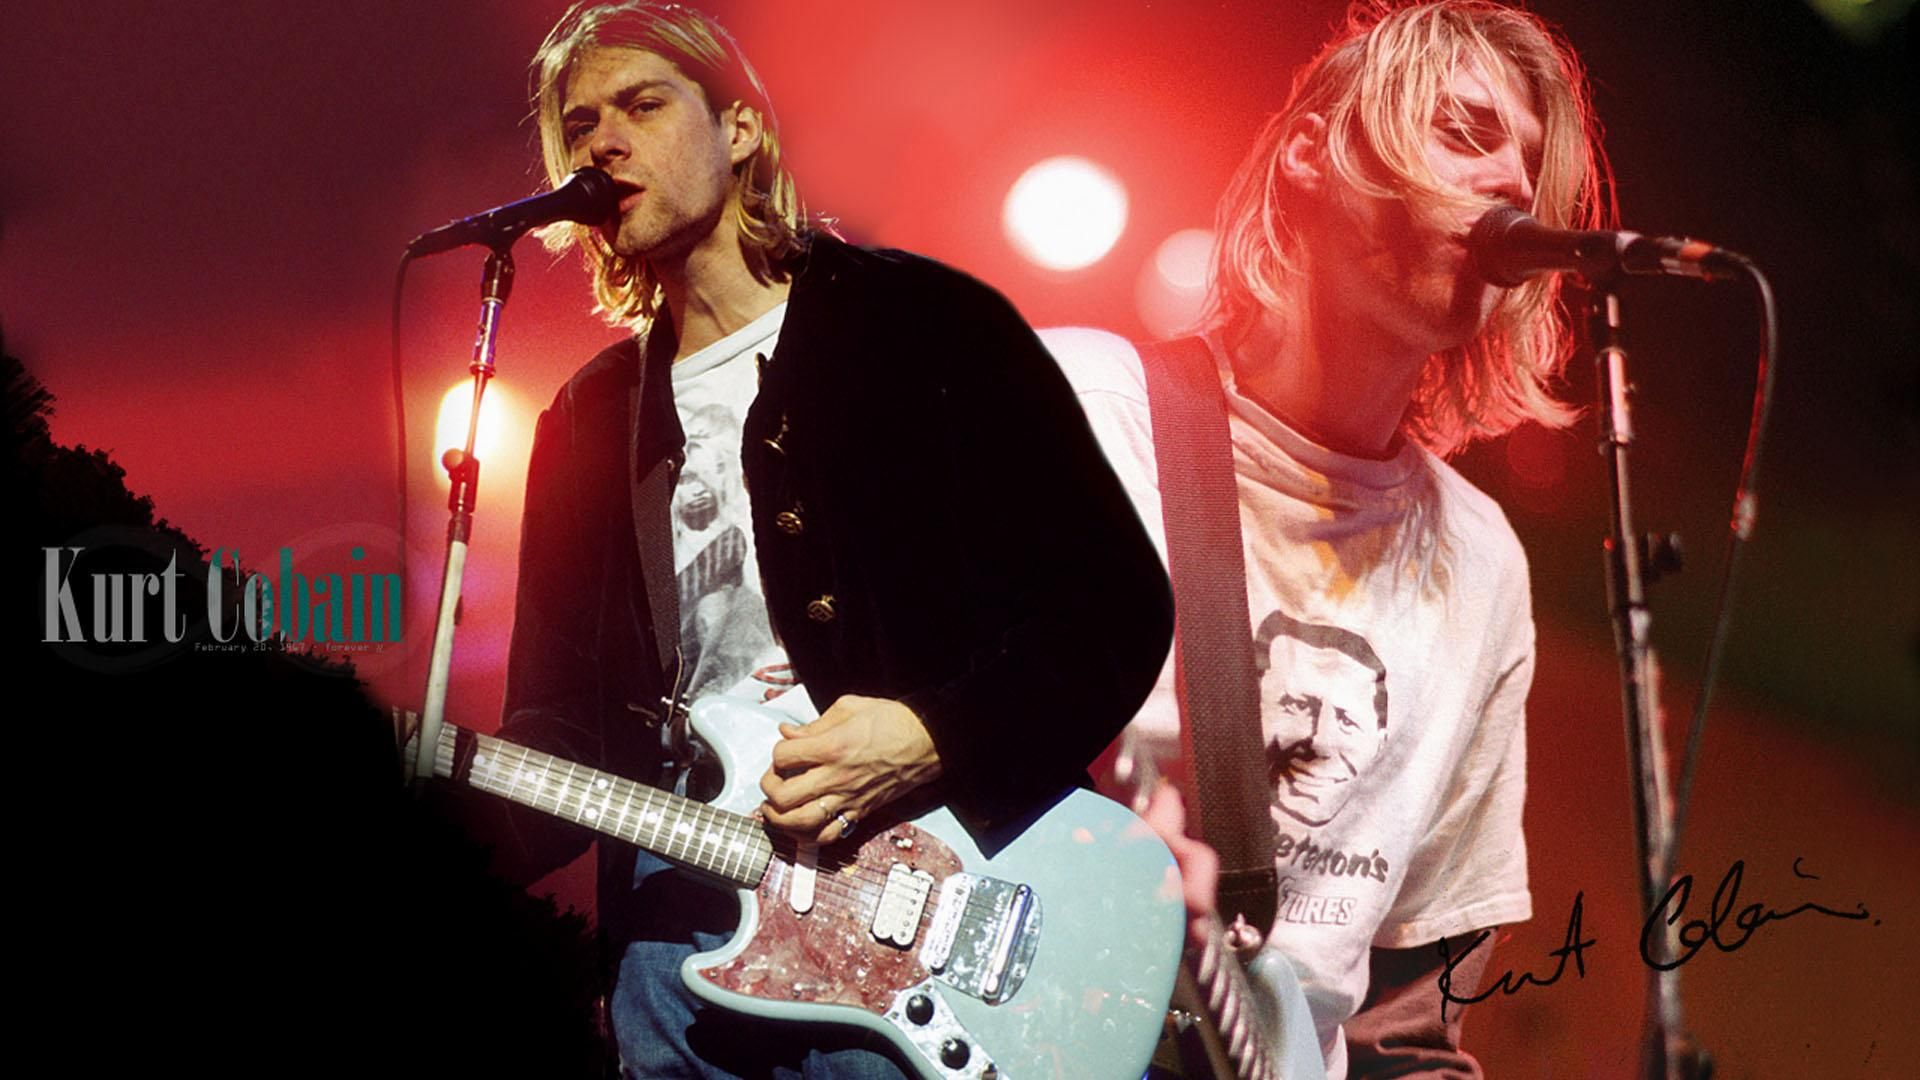 Nirvana Kurt Cobain Wallpaper By Dilshan On Deviantart 1024 768 Kurt Cobain Wallpaper 43 Wallpapers Adorable Wallp Kurt Cobain Nirvana Kurt Cobain Nirvana